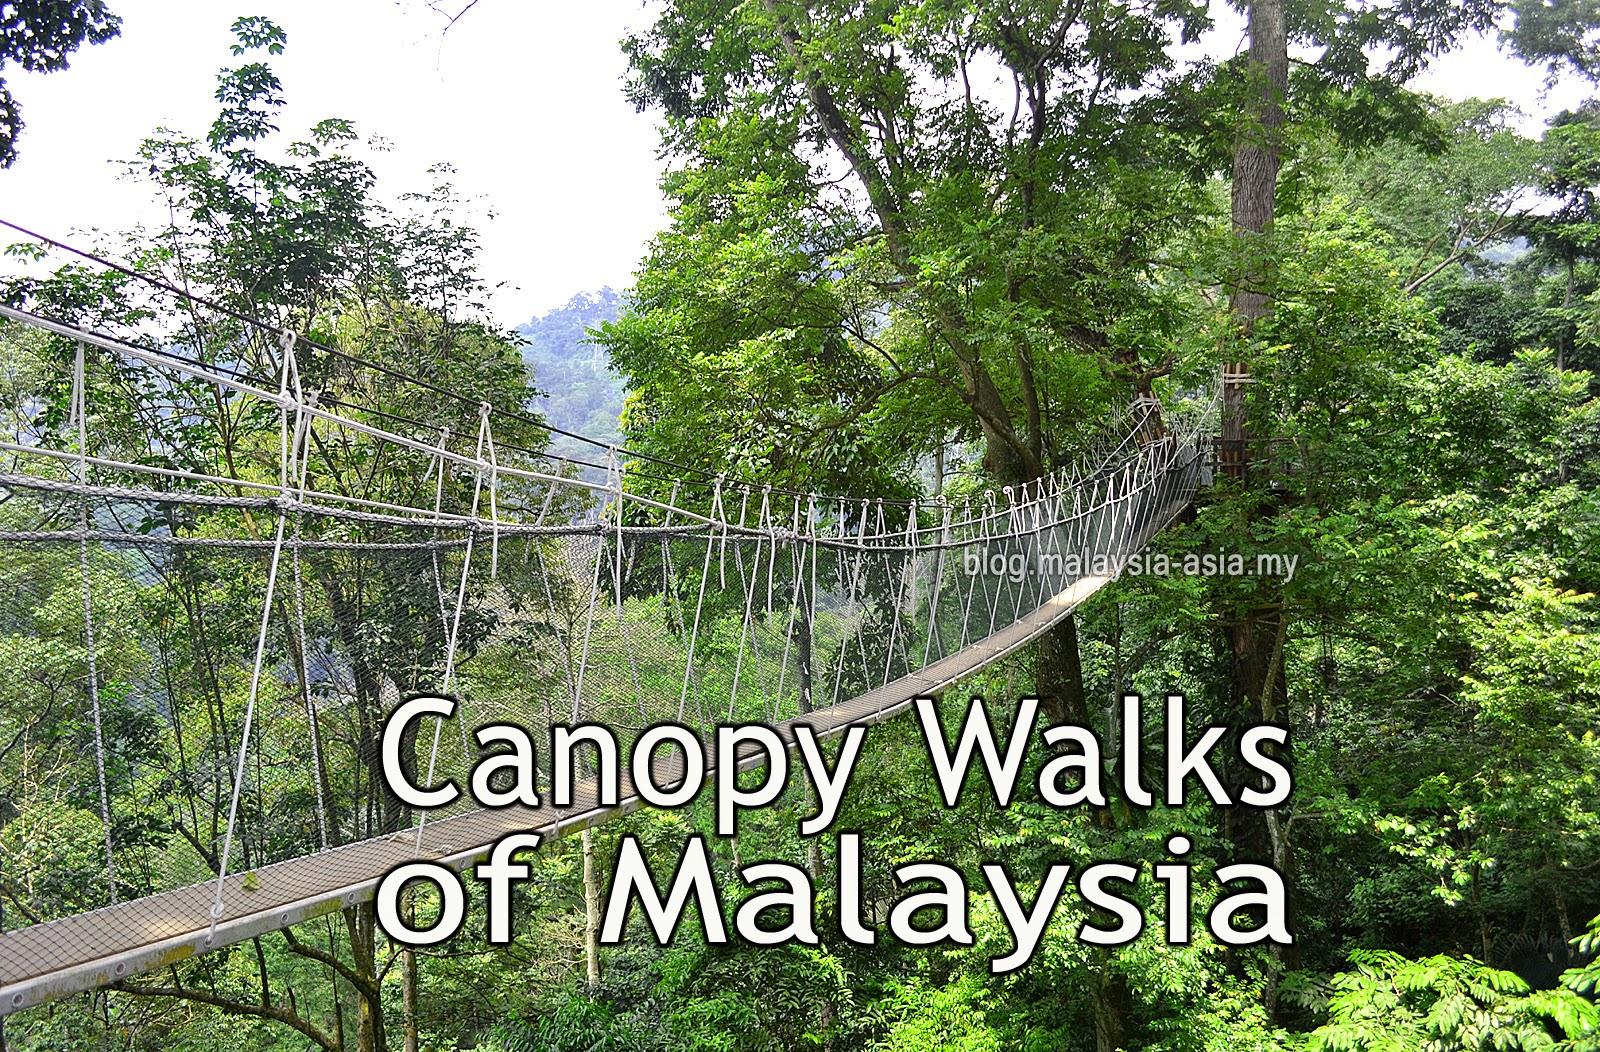 Malaysia Canopy Walks